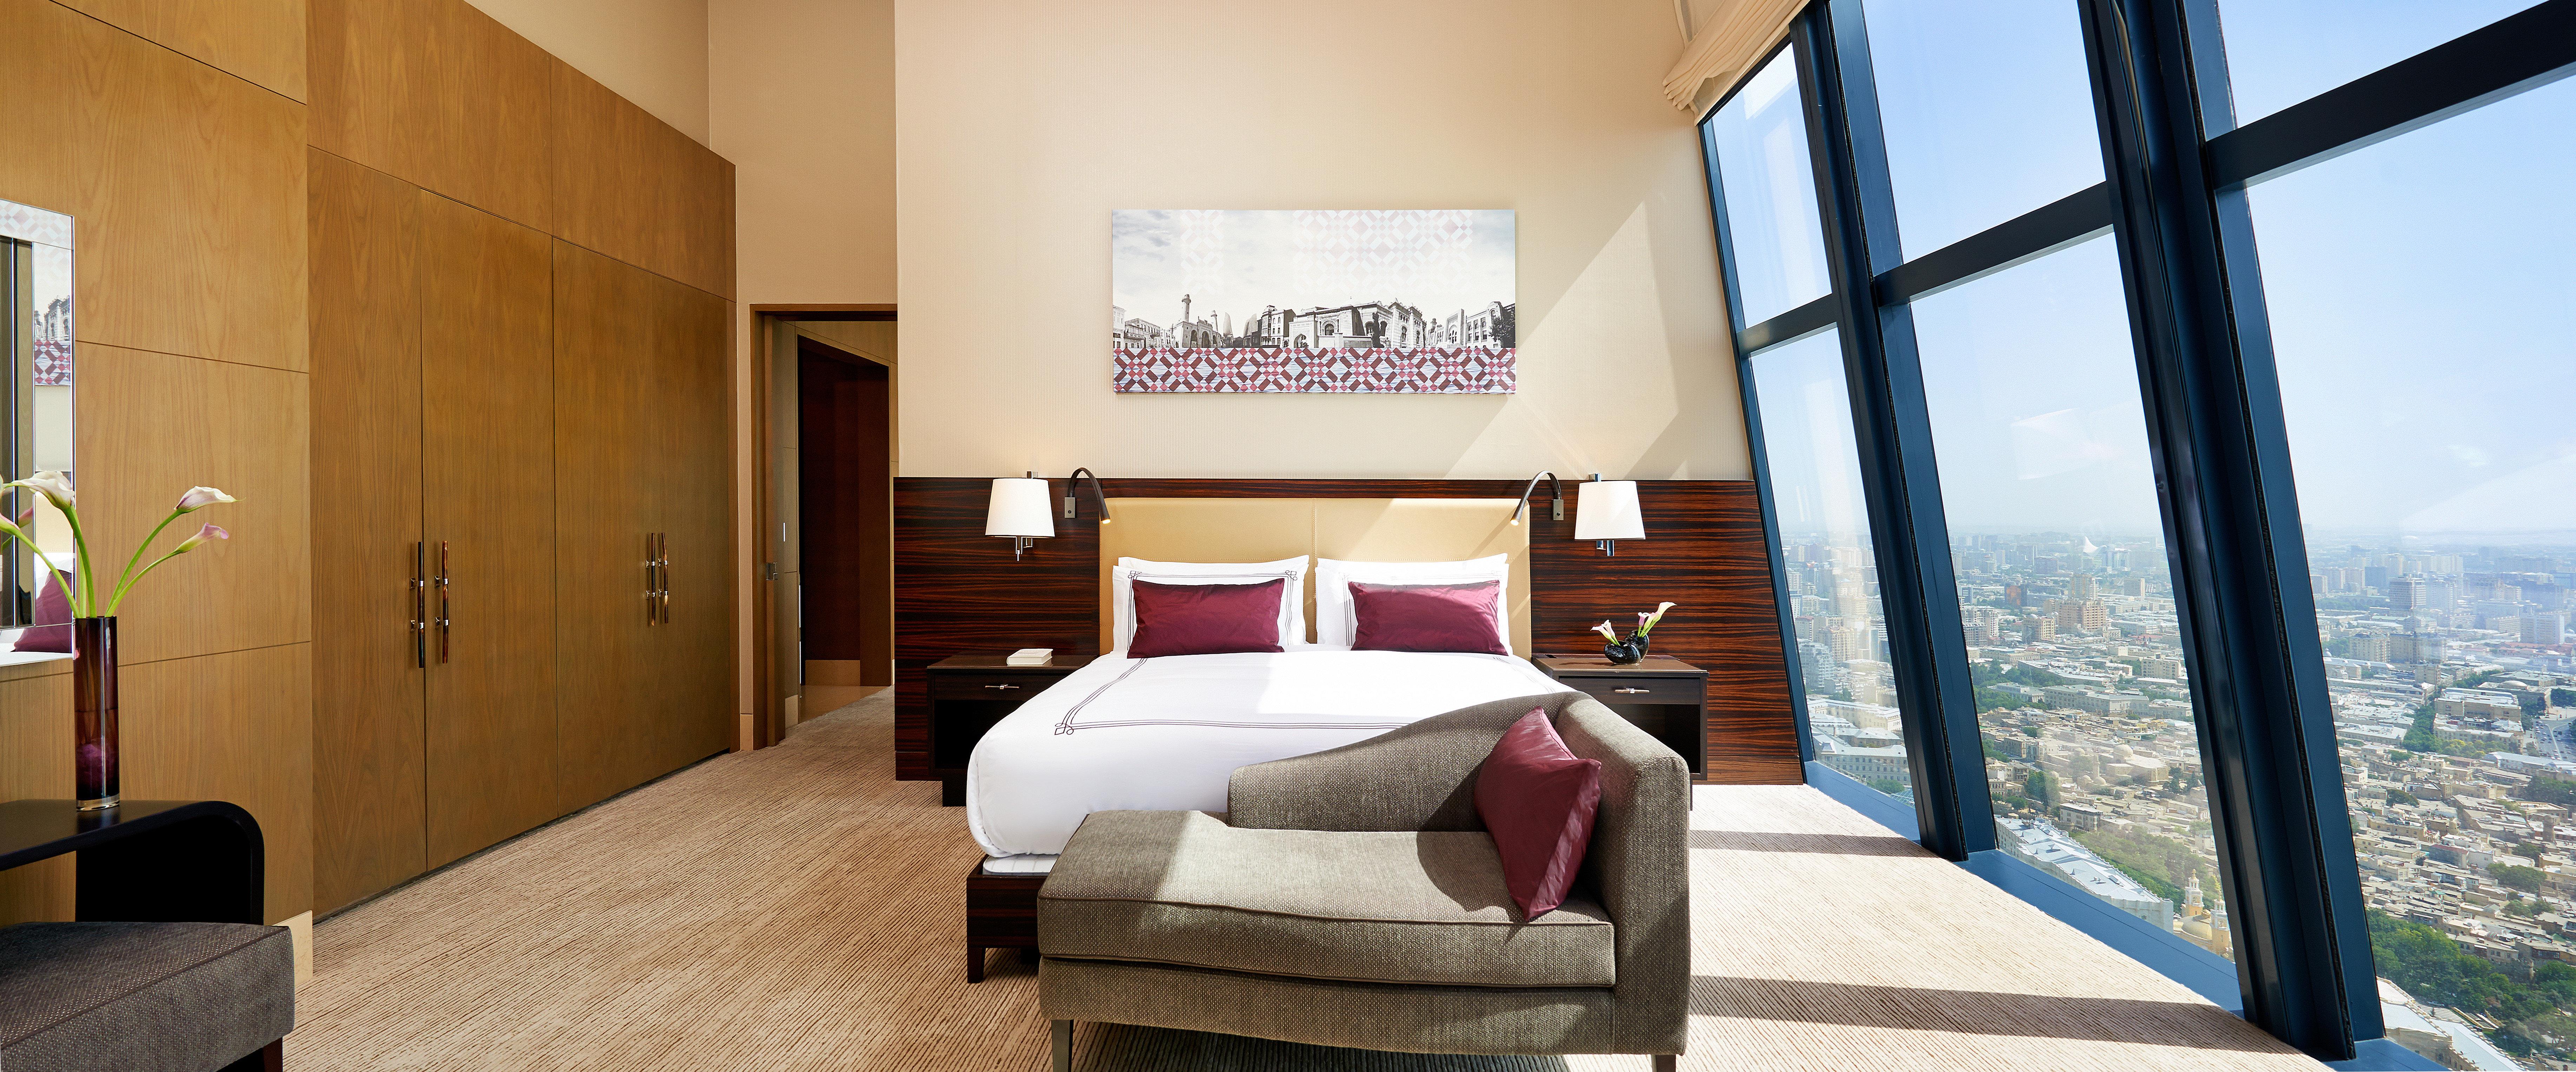 Bedroom City Hip Luxury Modern Scenic views Suite property home cottage Villa Resort